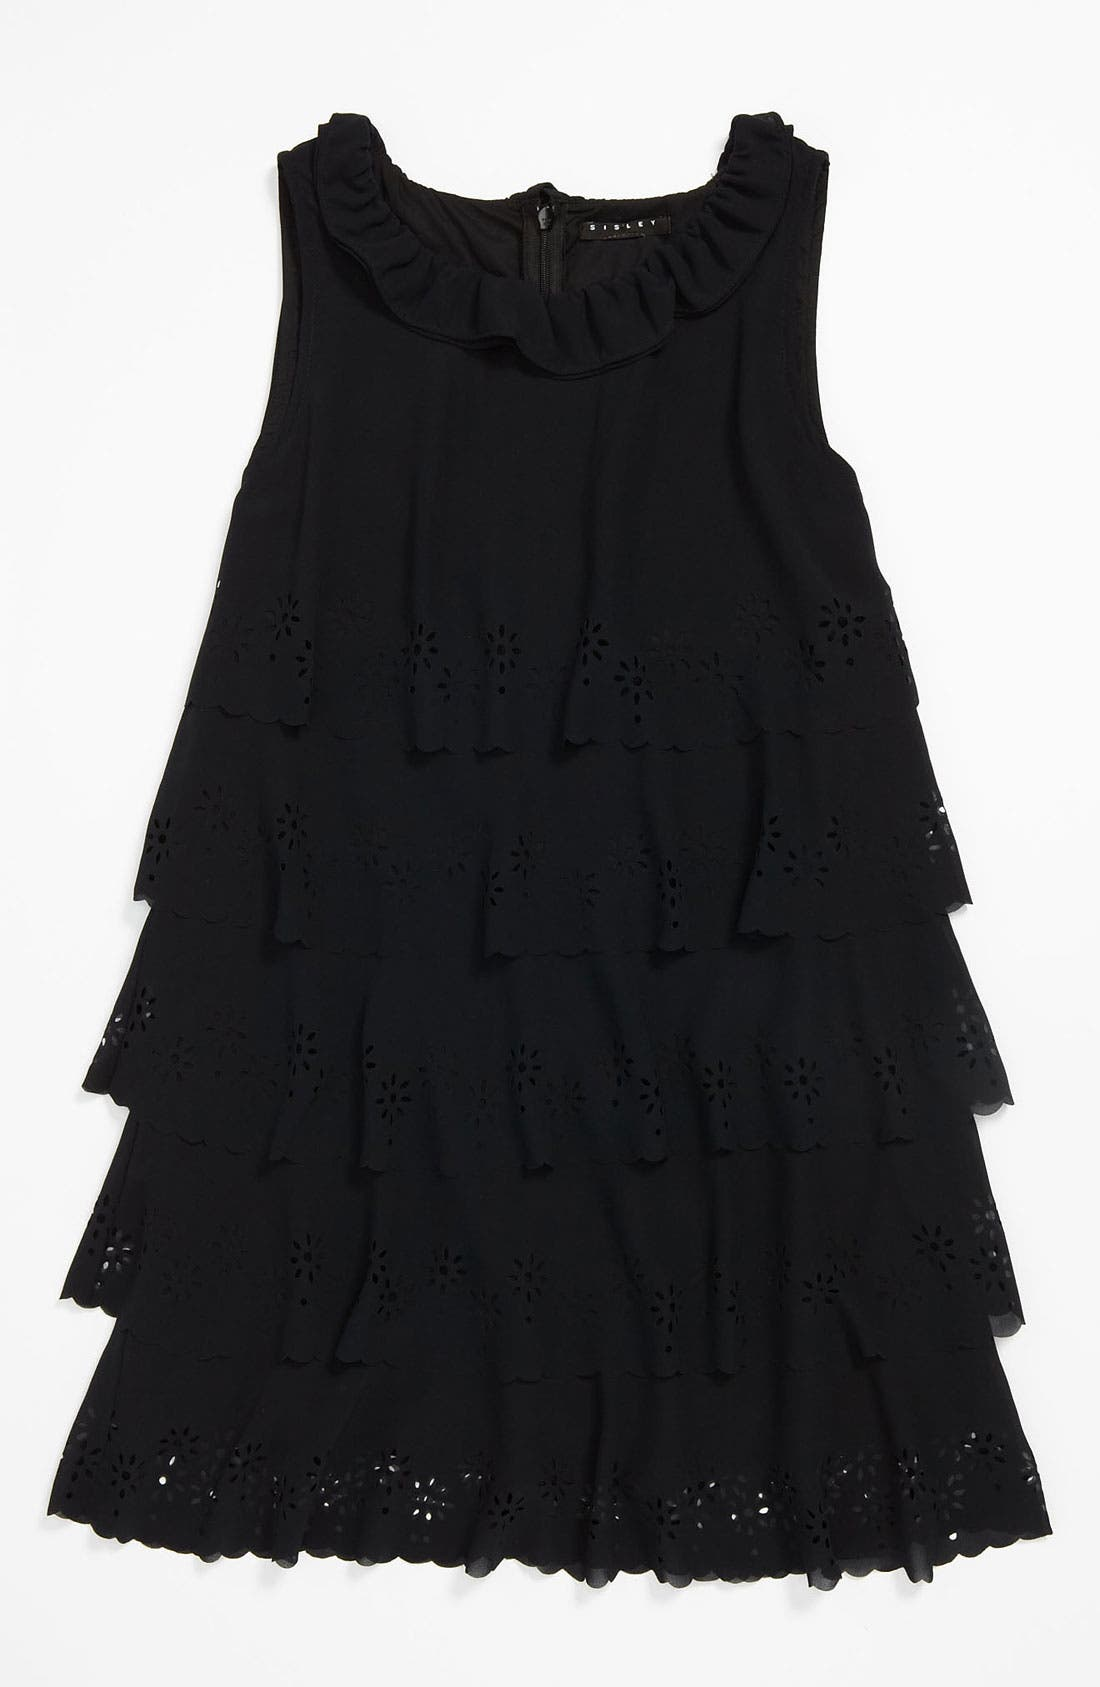 Alternate Image 1 Selected - Sisley Young Dress (Big Girls)